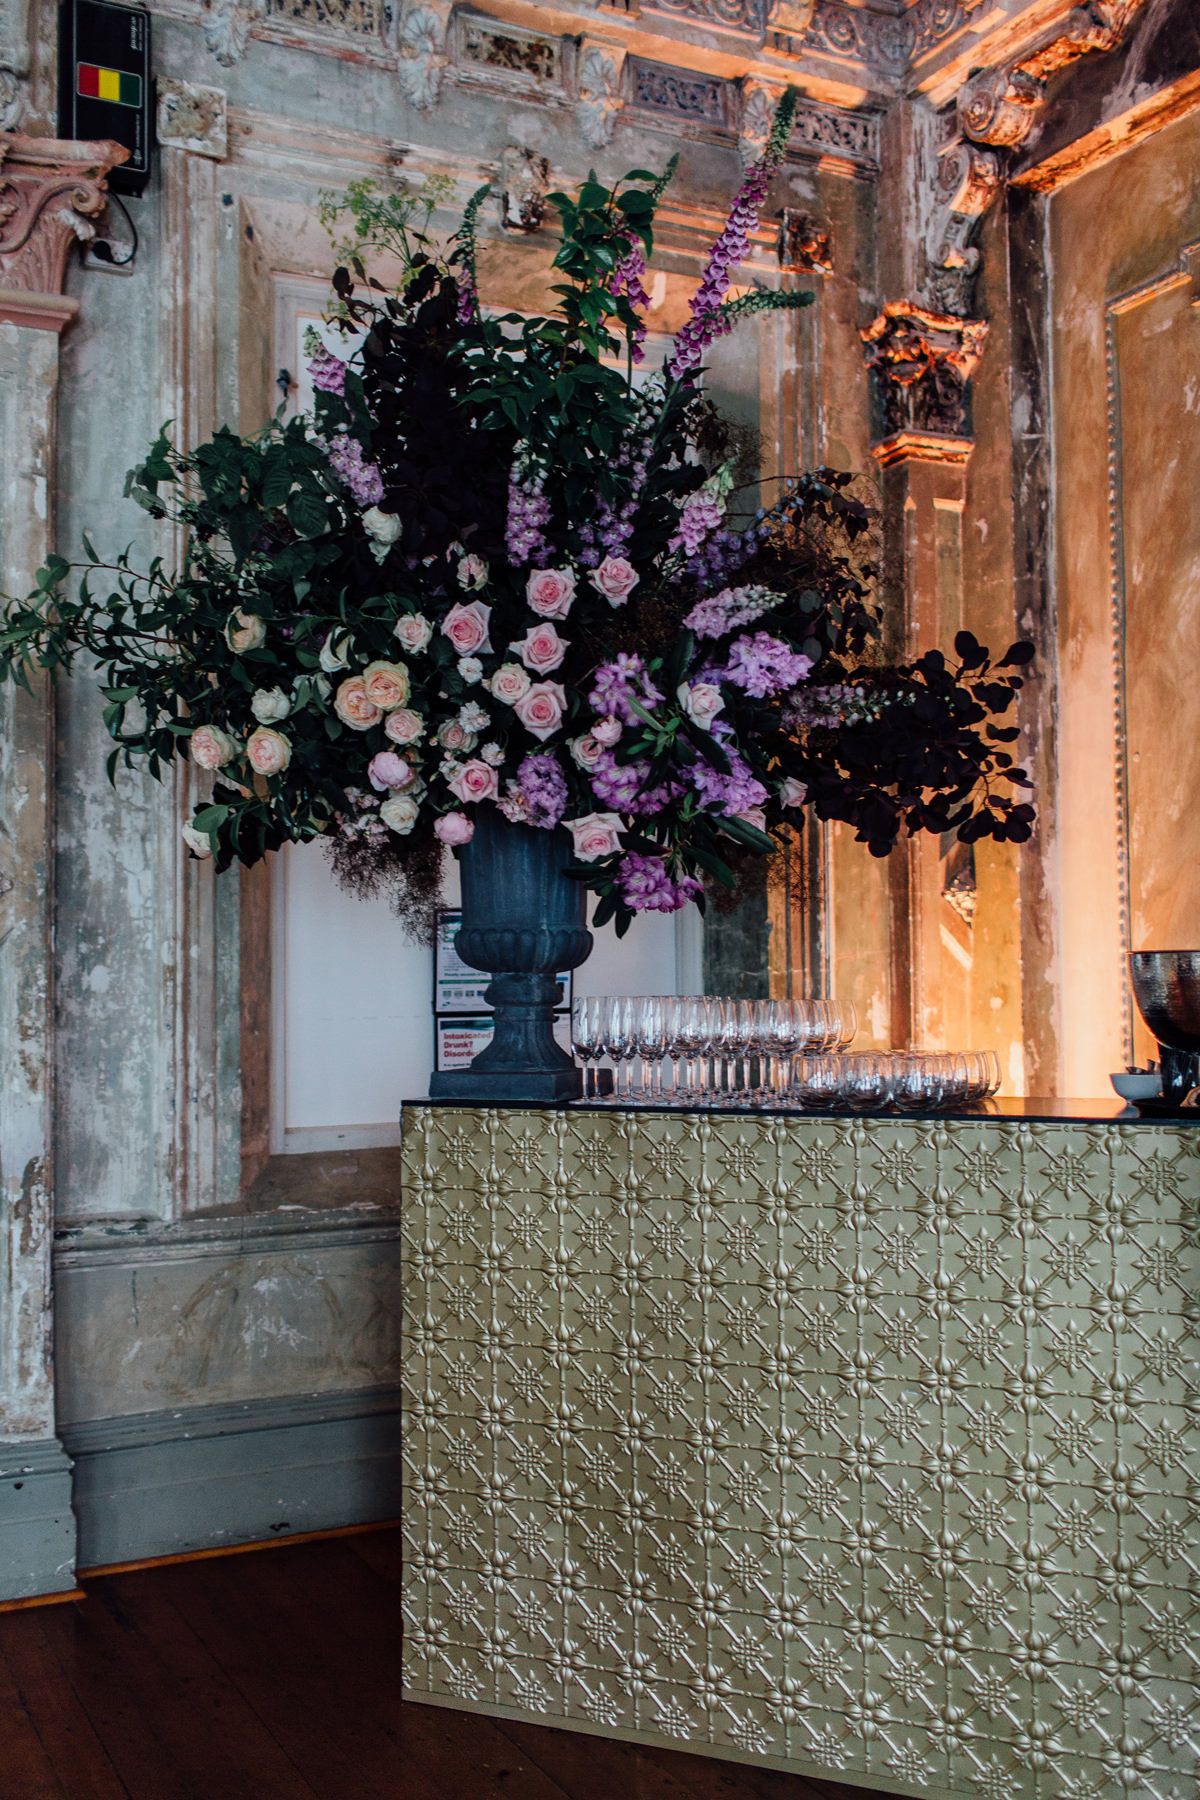 106909-kayla-jamess-grand-elegant-ballroom-wedding-by-sonja-c-photography.jpg